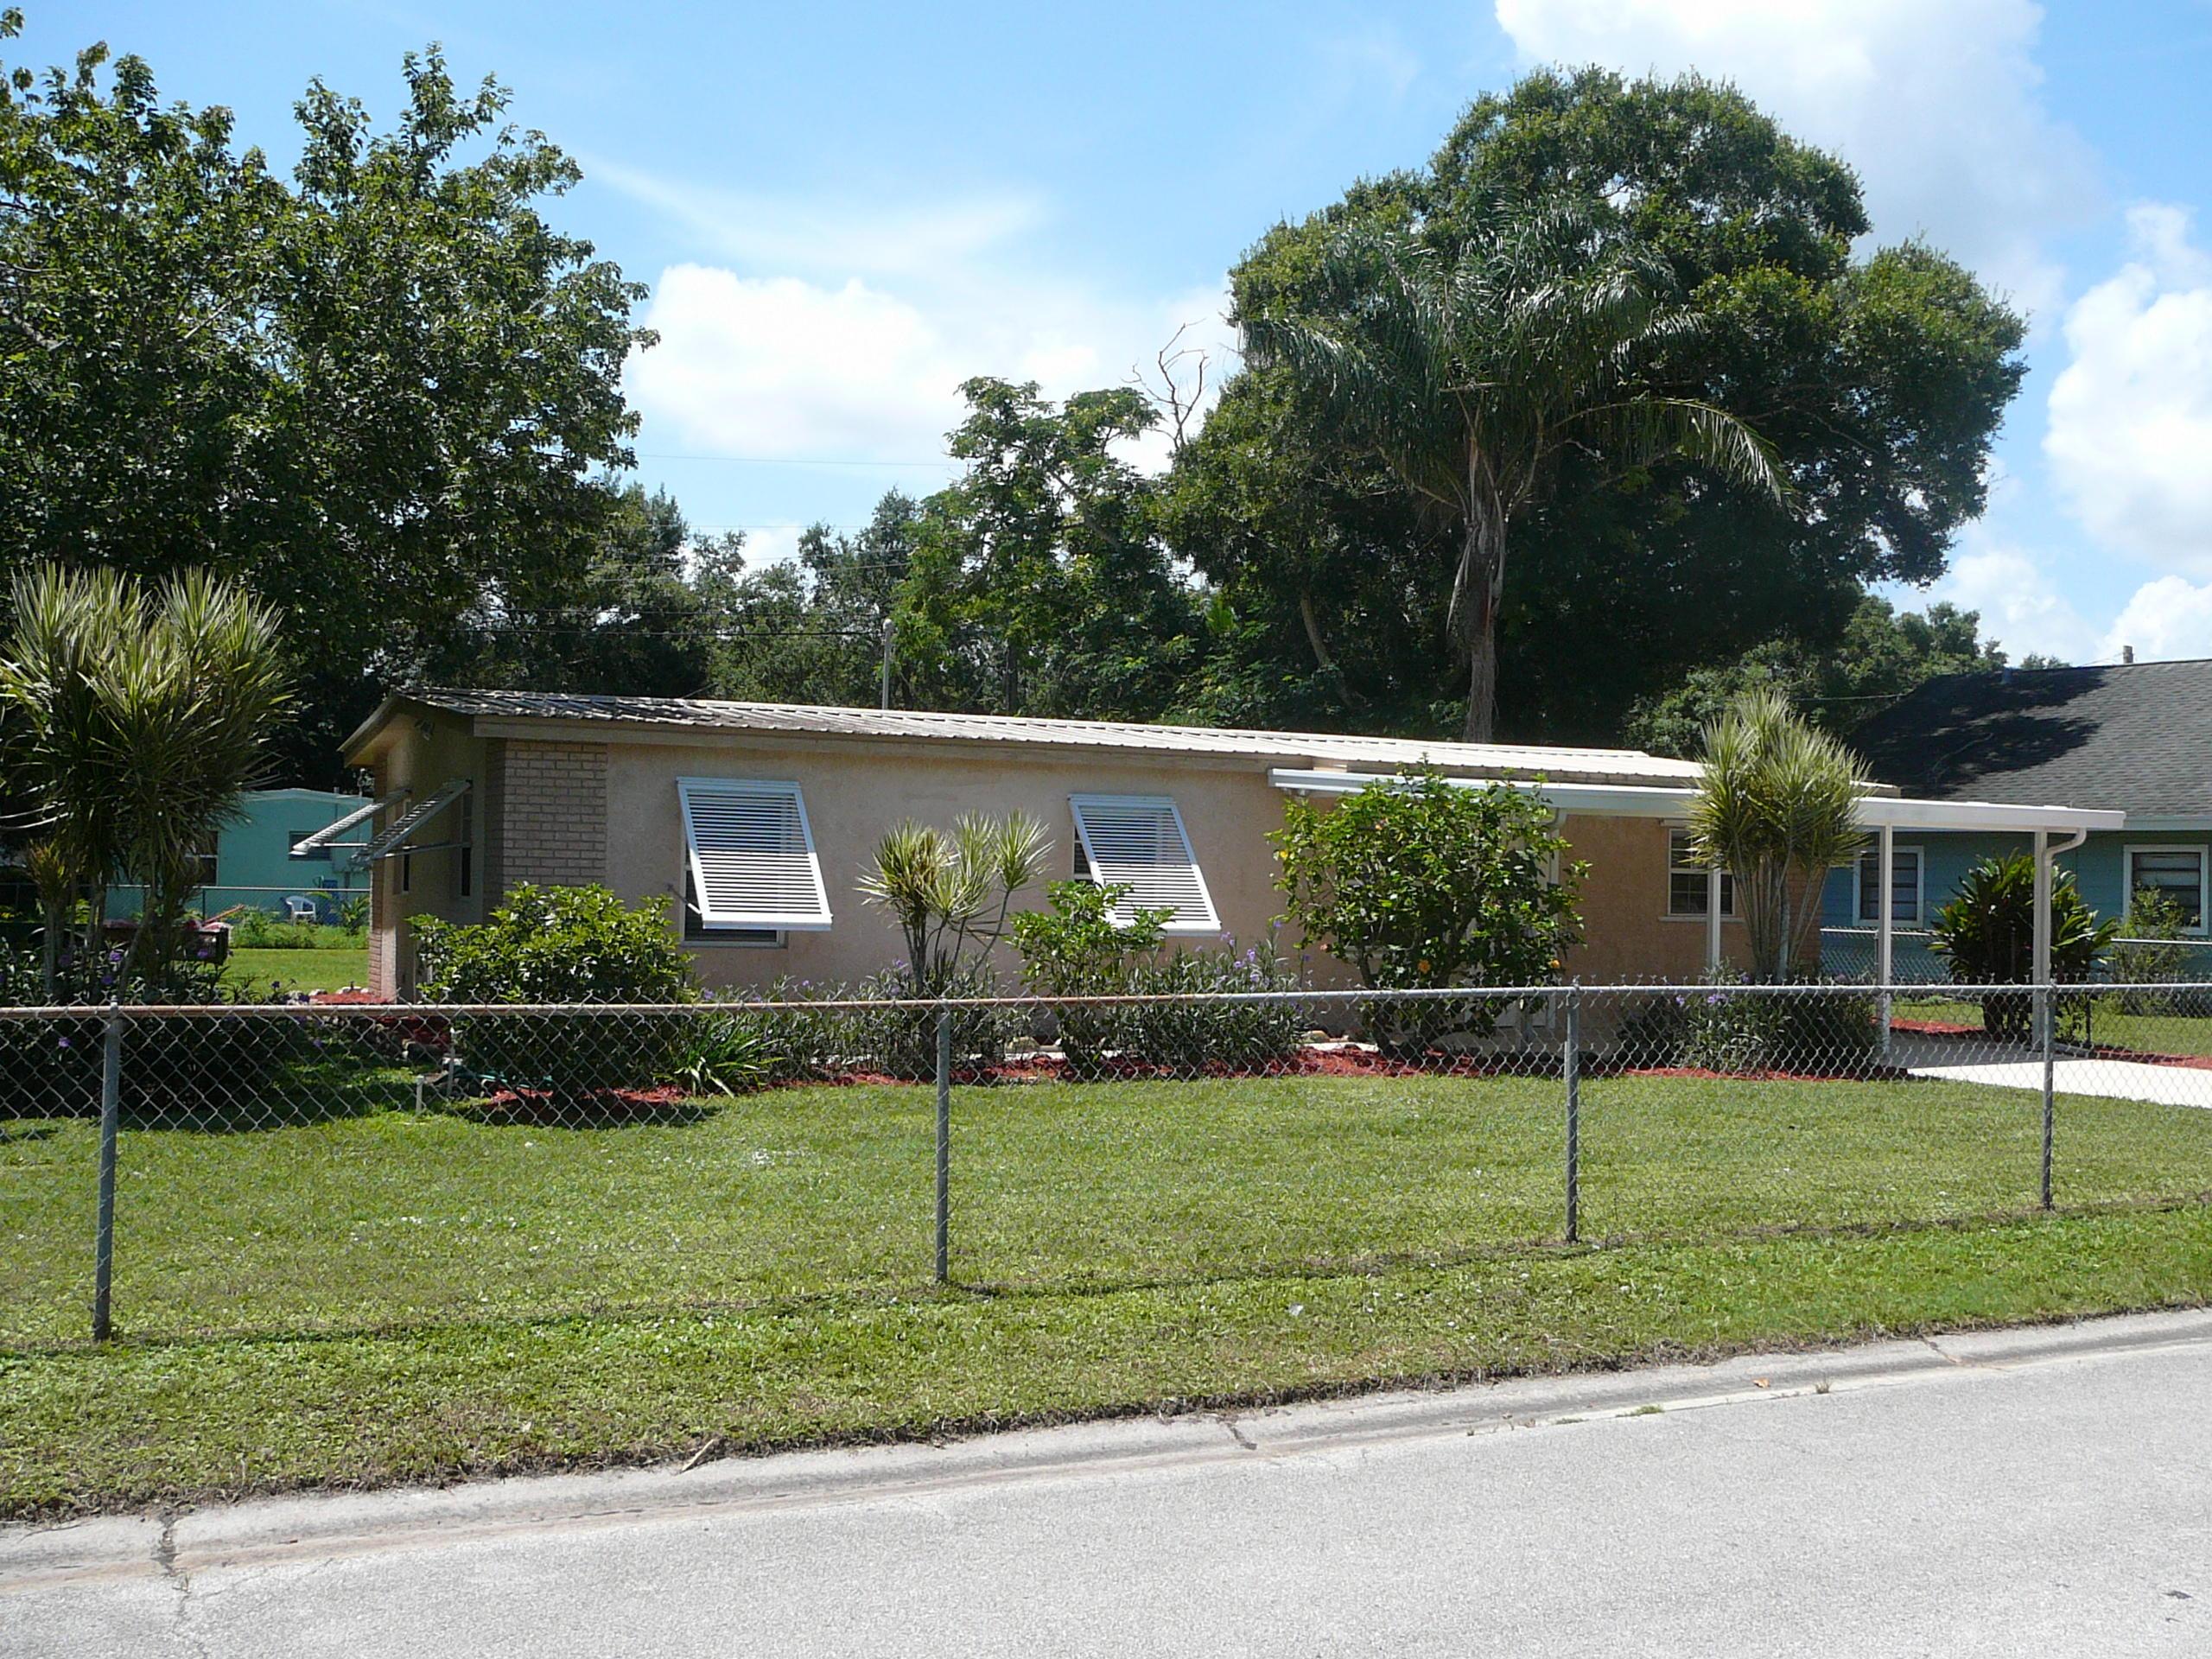 365 Borraclough Street, Fort Pierce, FL 34982